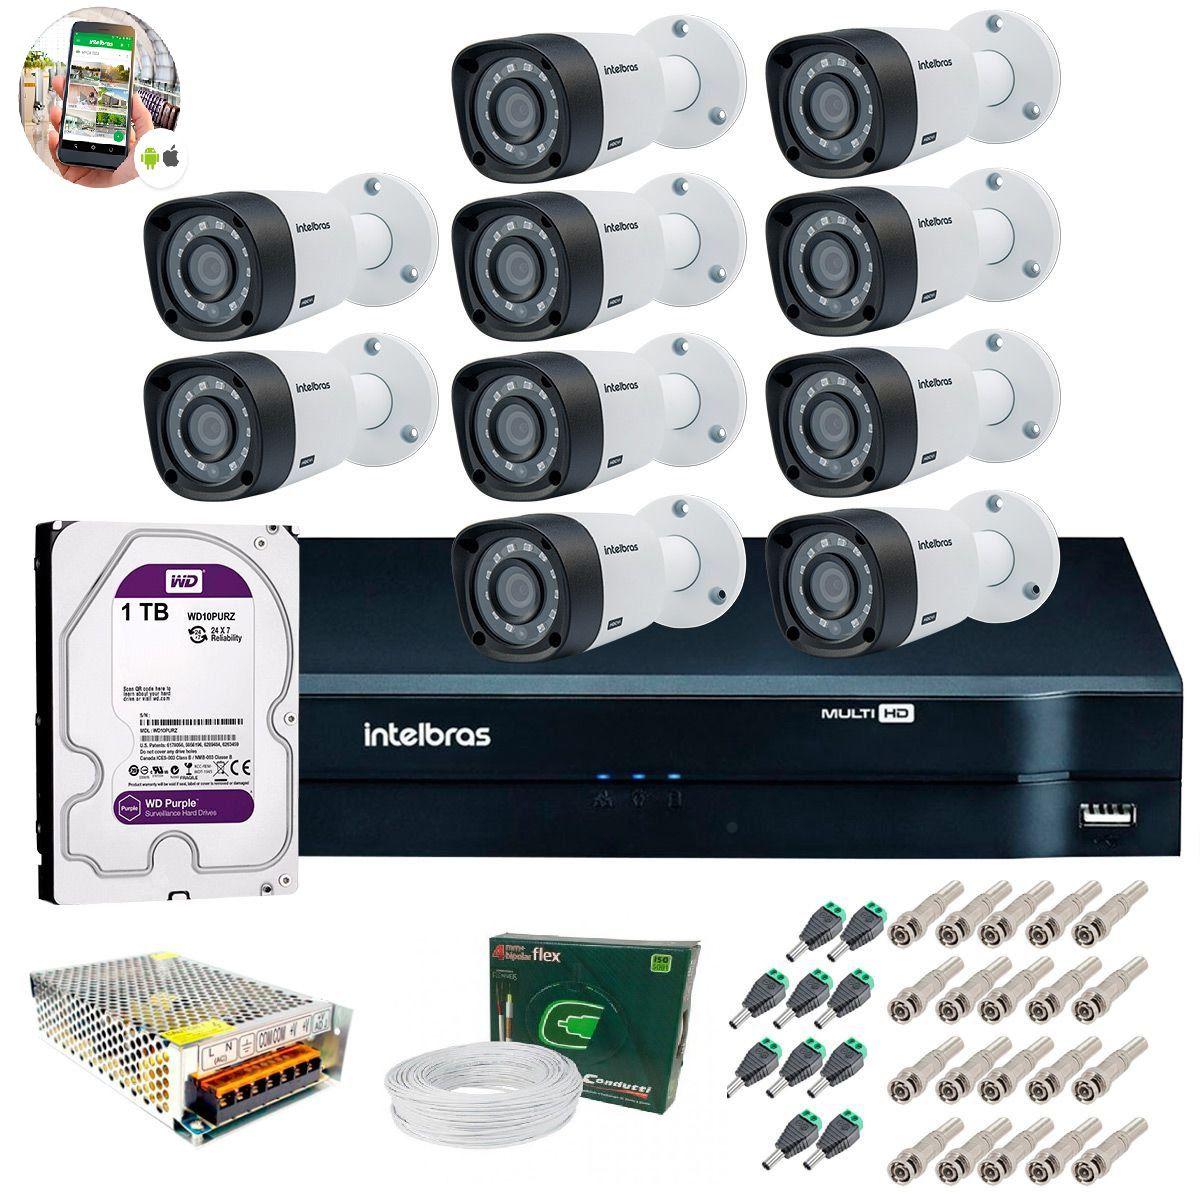 Kit 10 Câmeras de Segurança HD 720p Intelbras VHD 3120B G5 + DVR Intelbras Multi HD C/HD 1TB + Acessórios